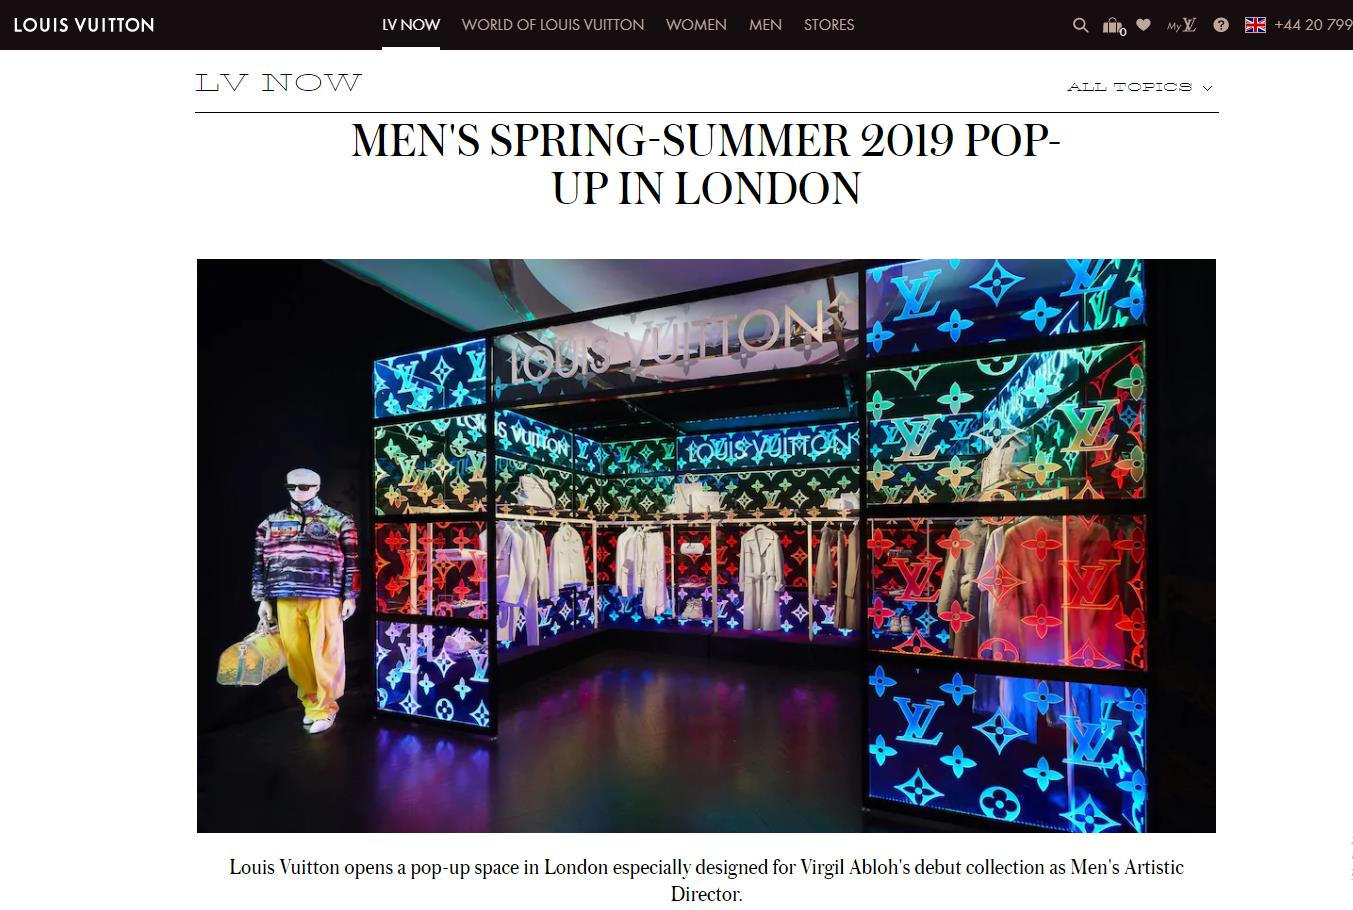 Louis Vuitton 新任男装创意总监 Virgil Abloh在伦敦和上海开设快闪店,发布上任以来首个男装系列